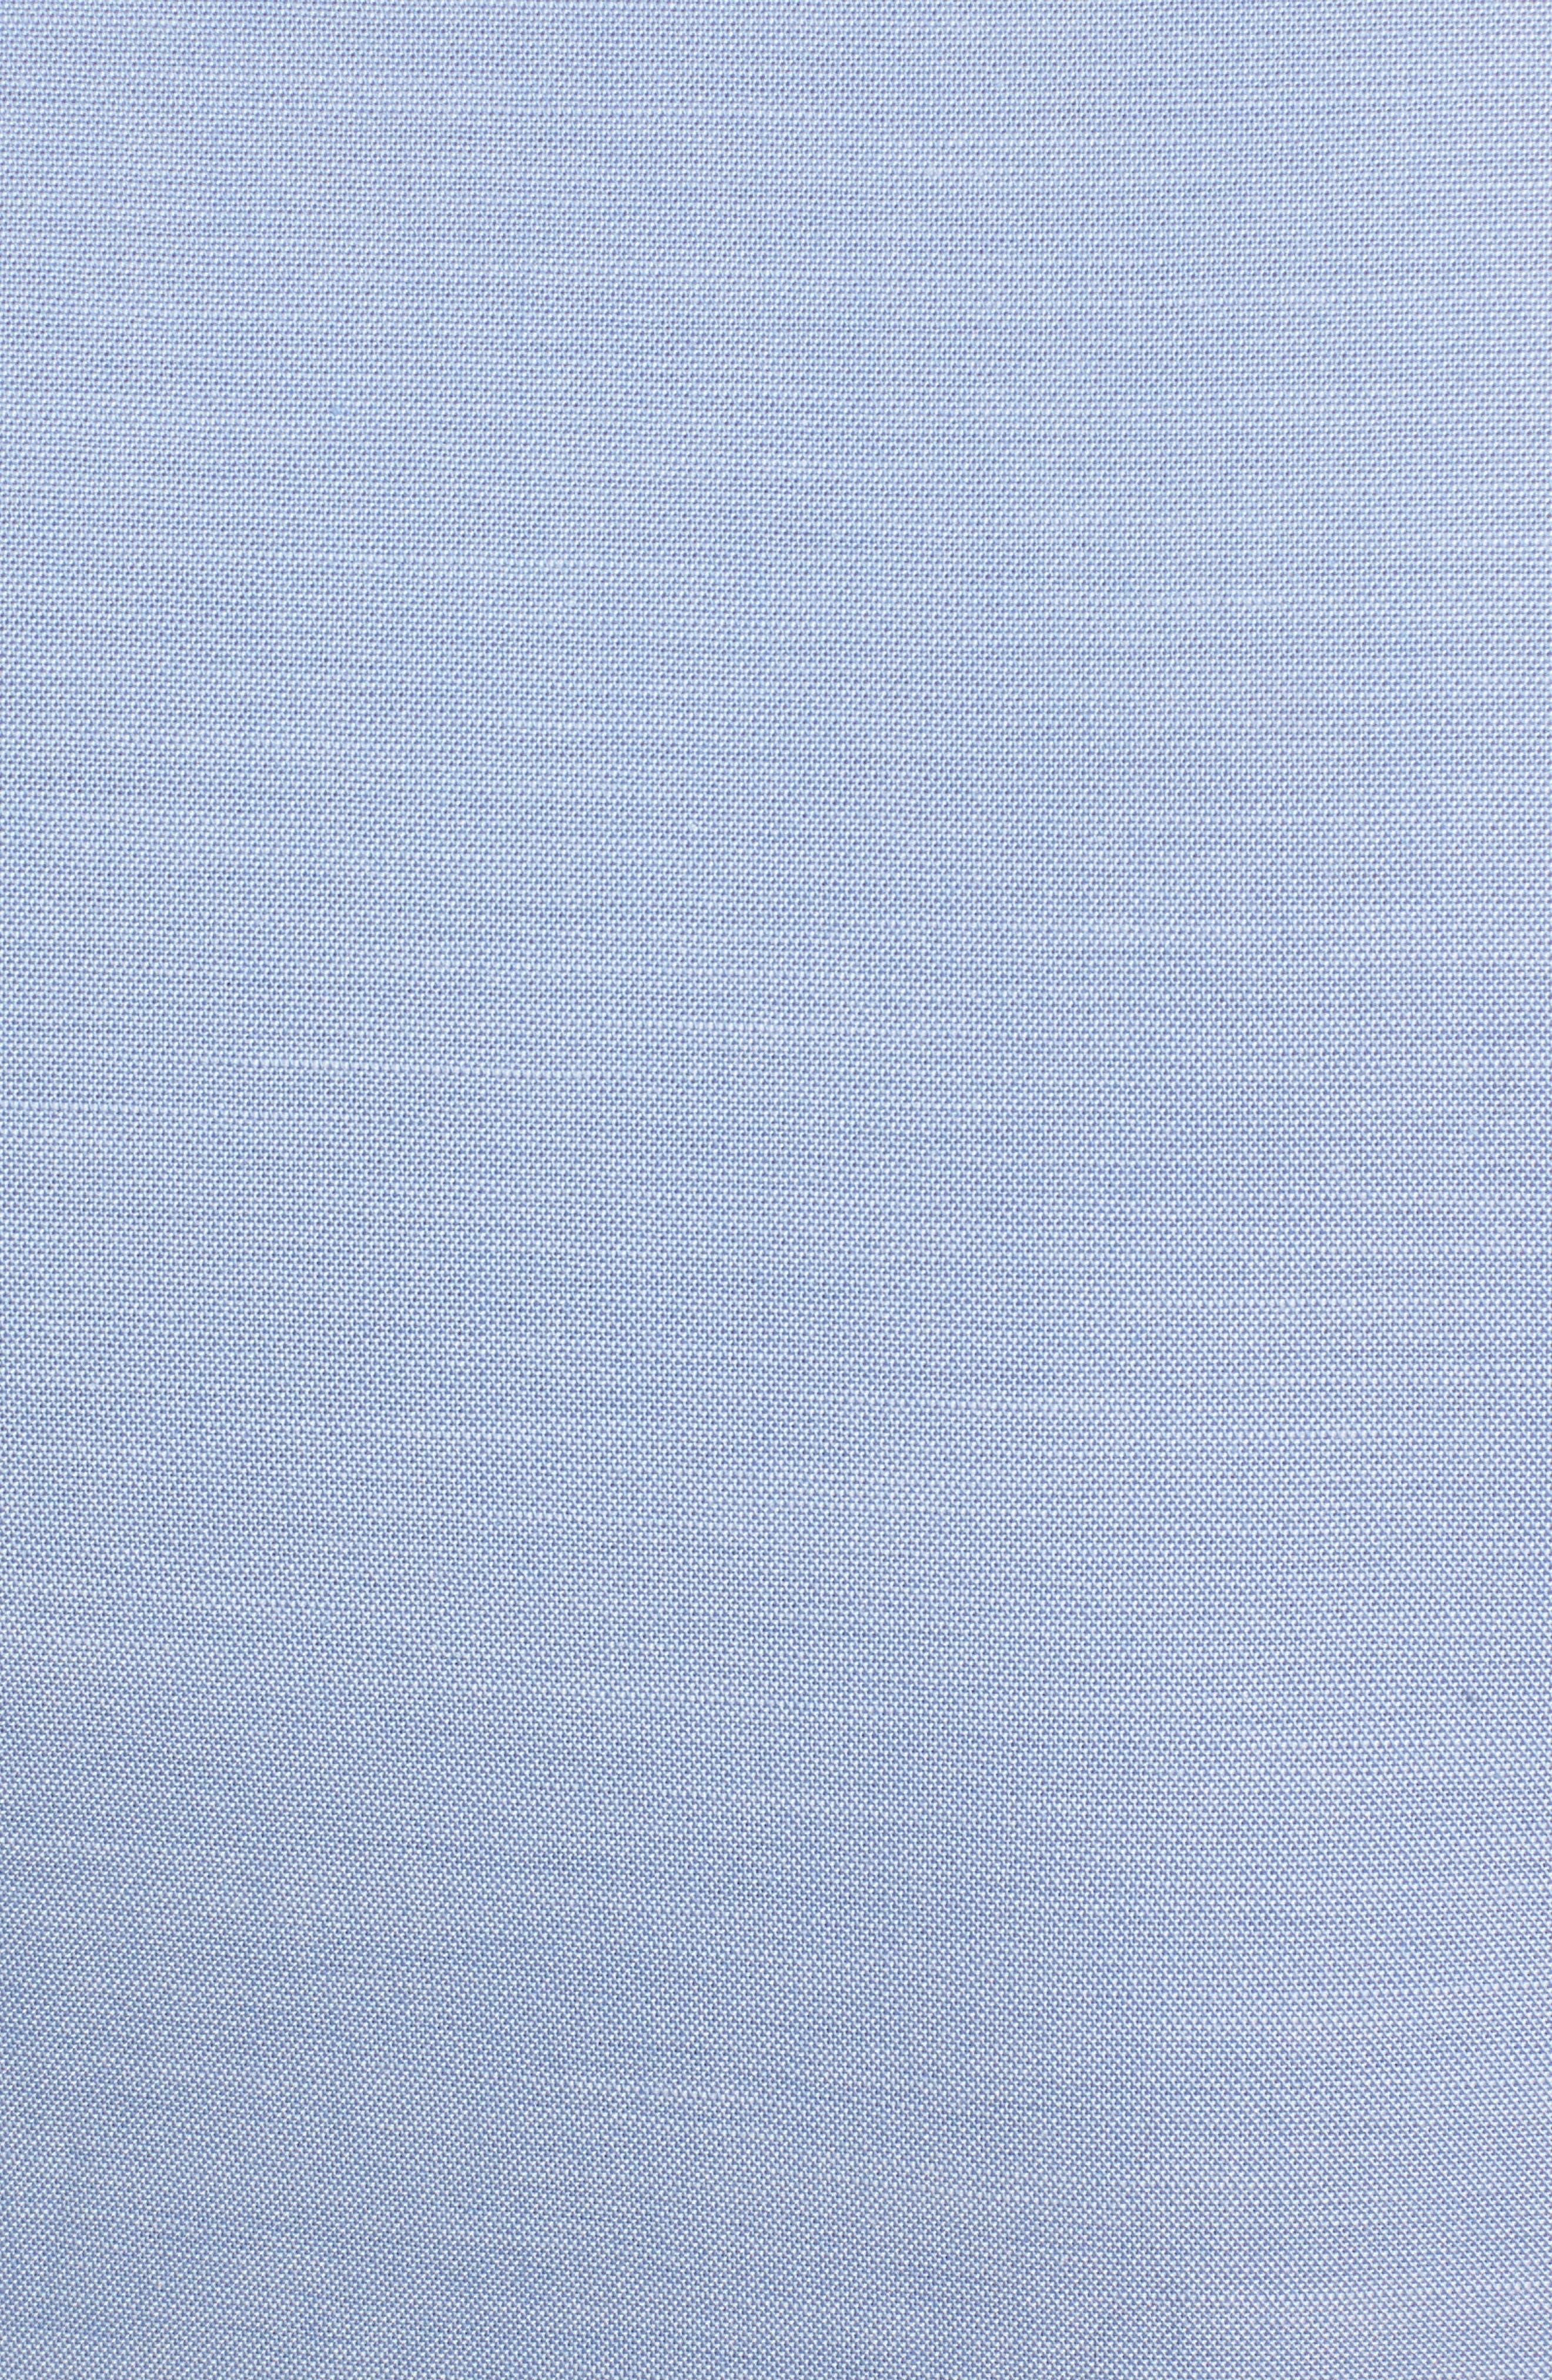 Cotton Chambray Sleeveless Top,                             Alternate thumbnail 5, color,